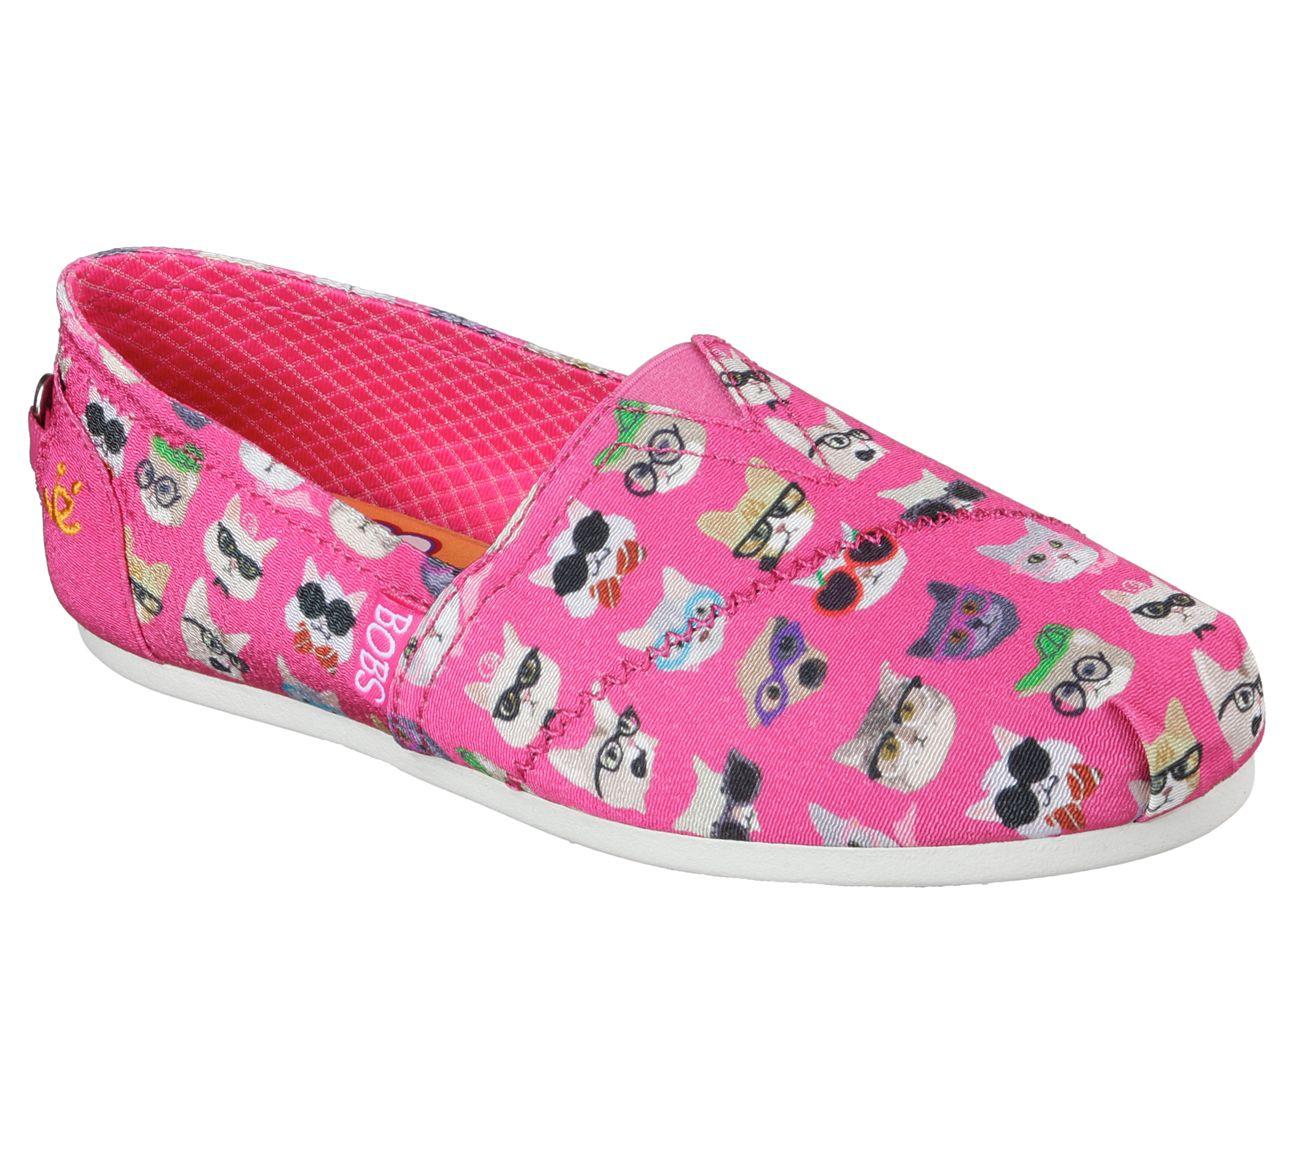 Bob shoes, Skechers bobs, Shoes